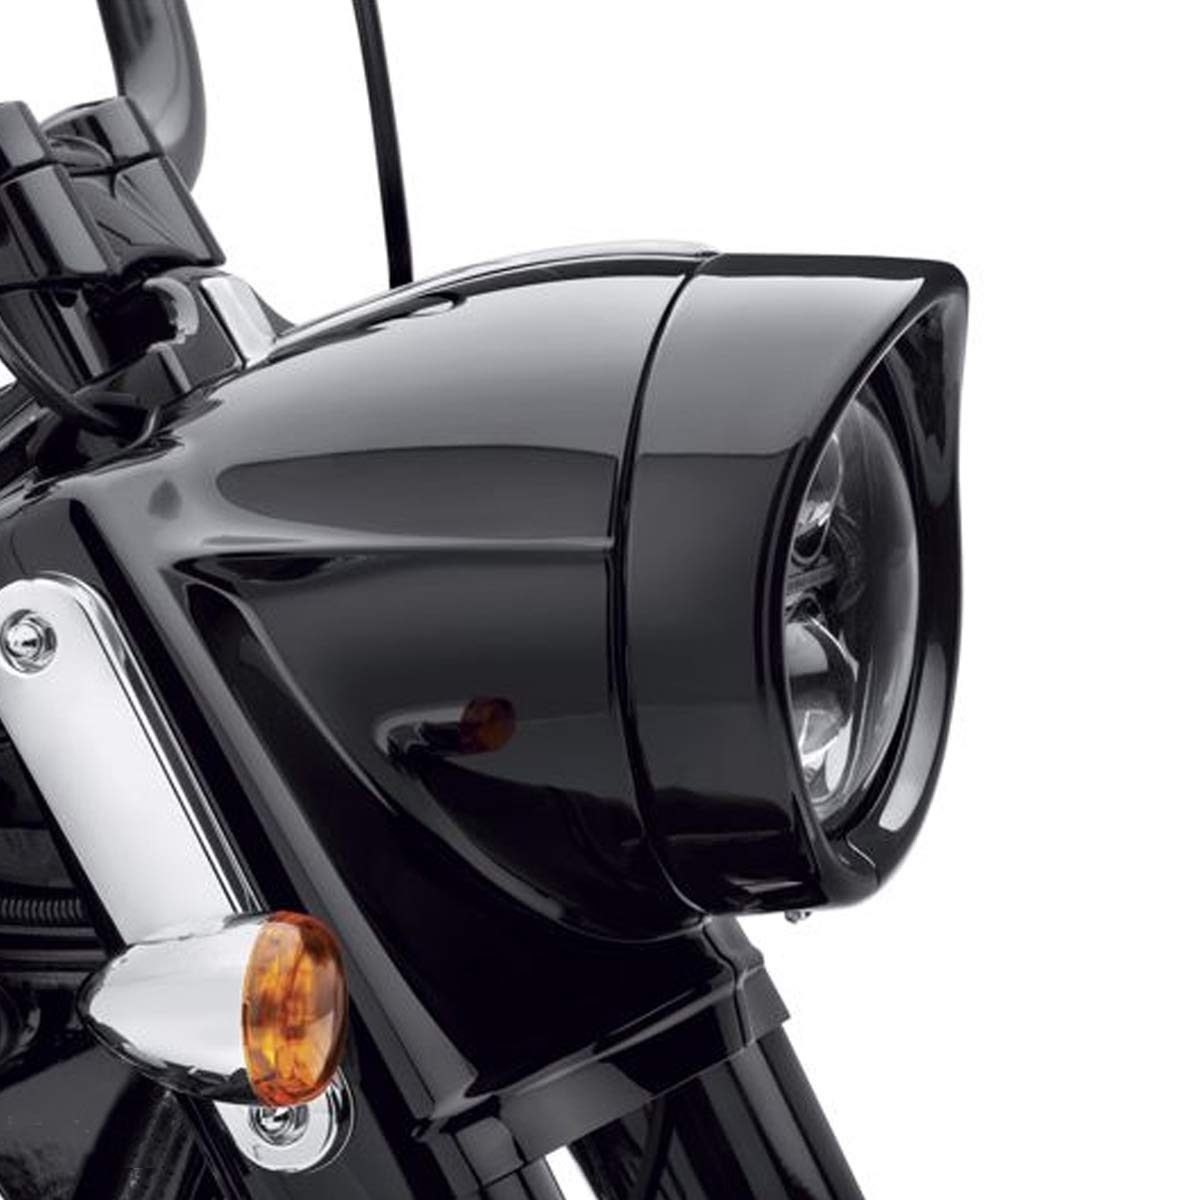 XIAOXI 5.75' Motorcycle Headlight Cover Black UV Shell Harley Davidson Trim Ring Visor or Harley Davidson 12-16 FLD 83-13 Touring Bikes 94-Later Road King